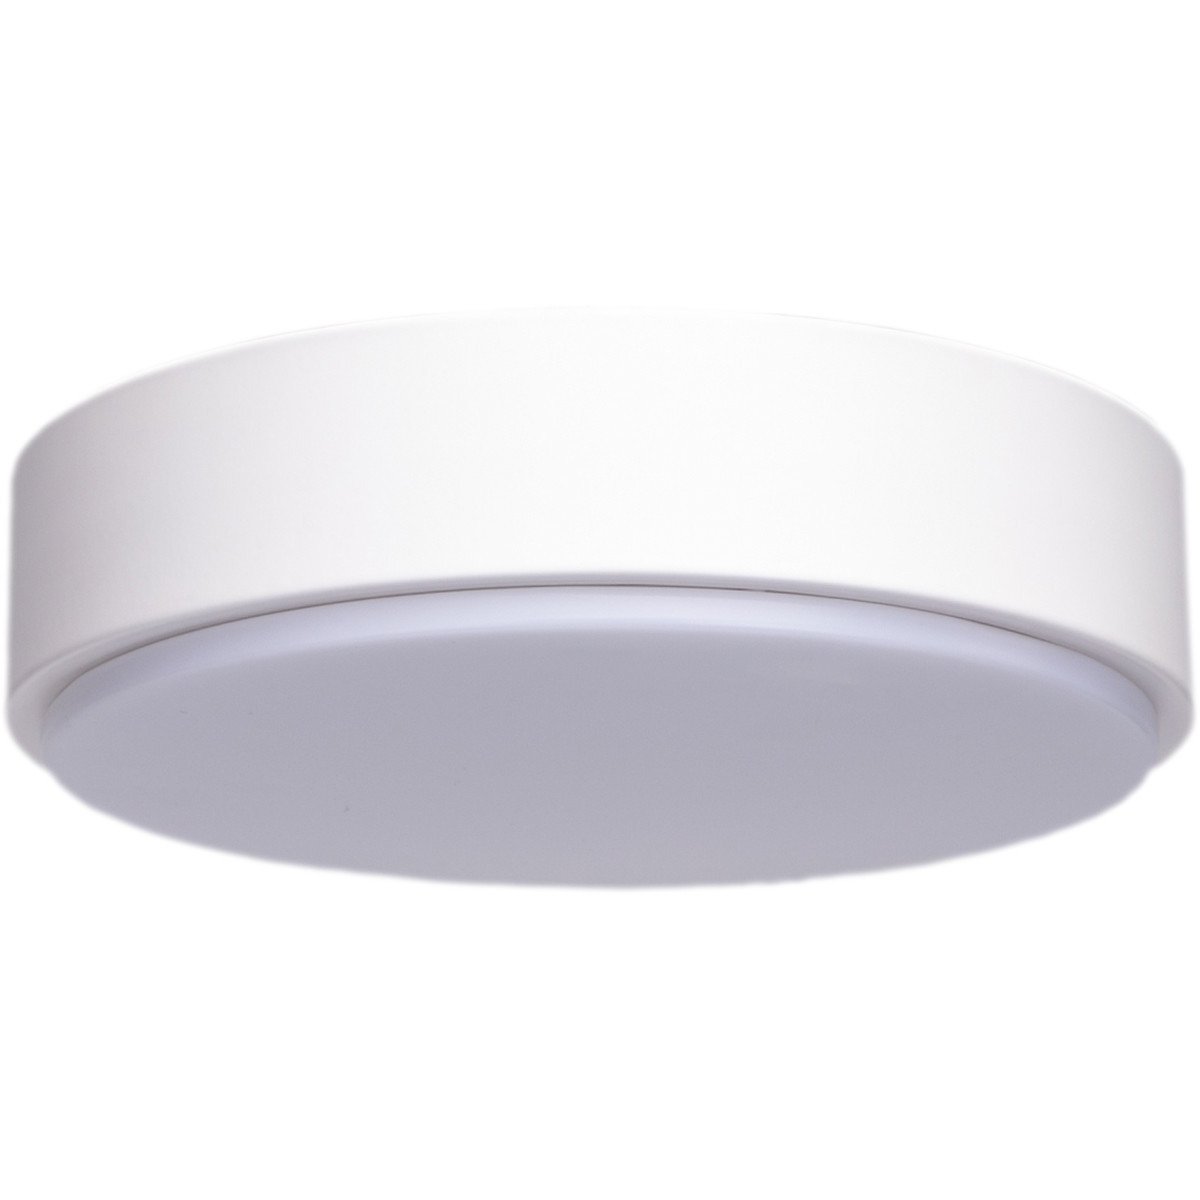 LED Plafondlamp - Aigi Santi - Opbouw Rond 12W - Helder/Koud Wit 6500K - Mat Wit Aluminium